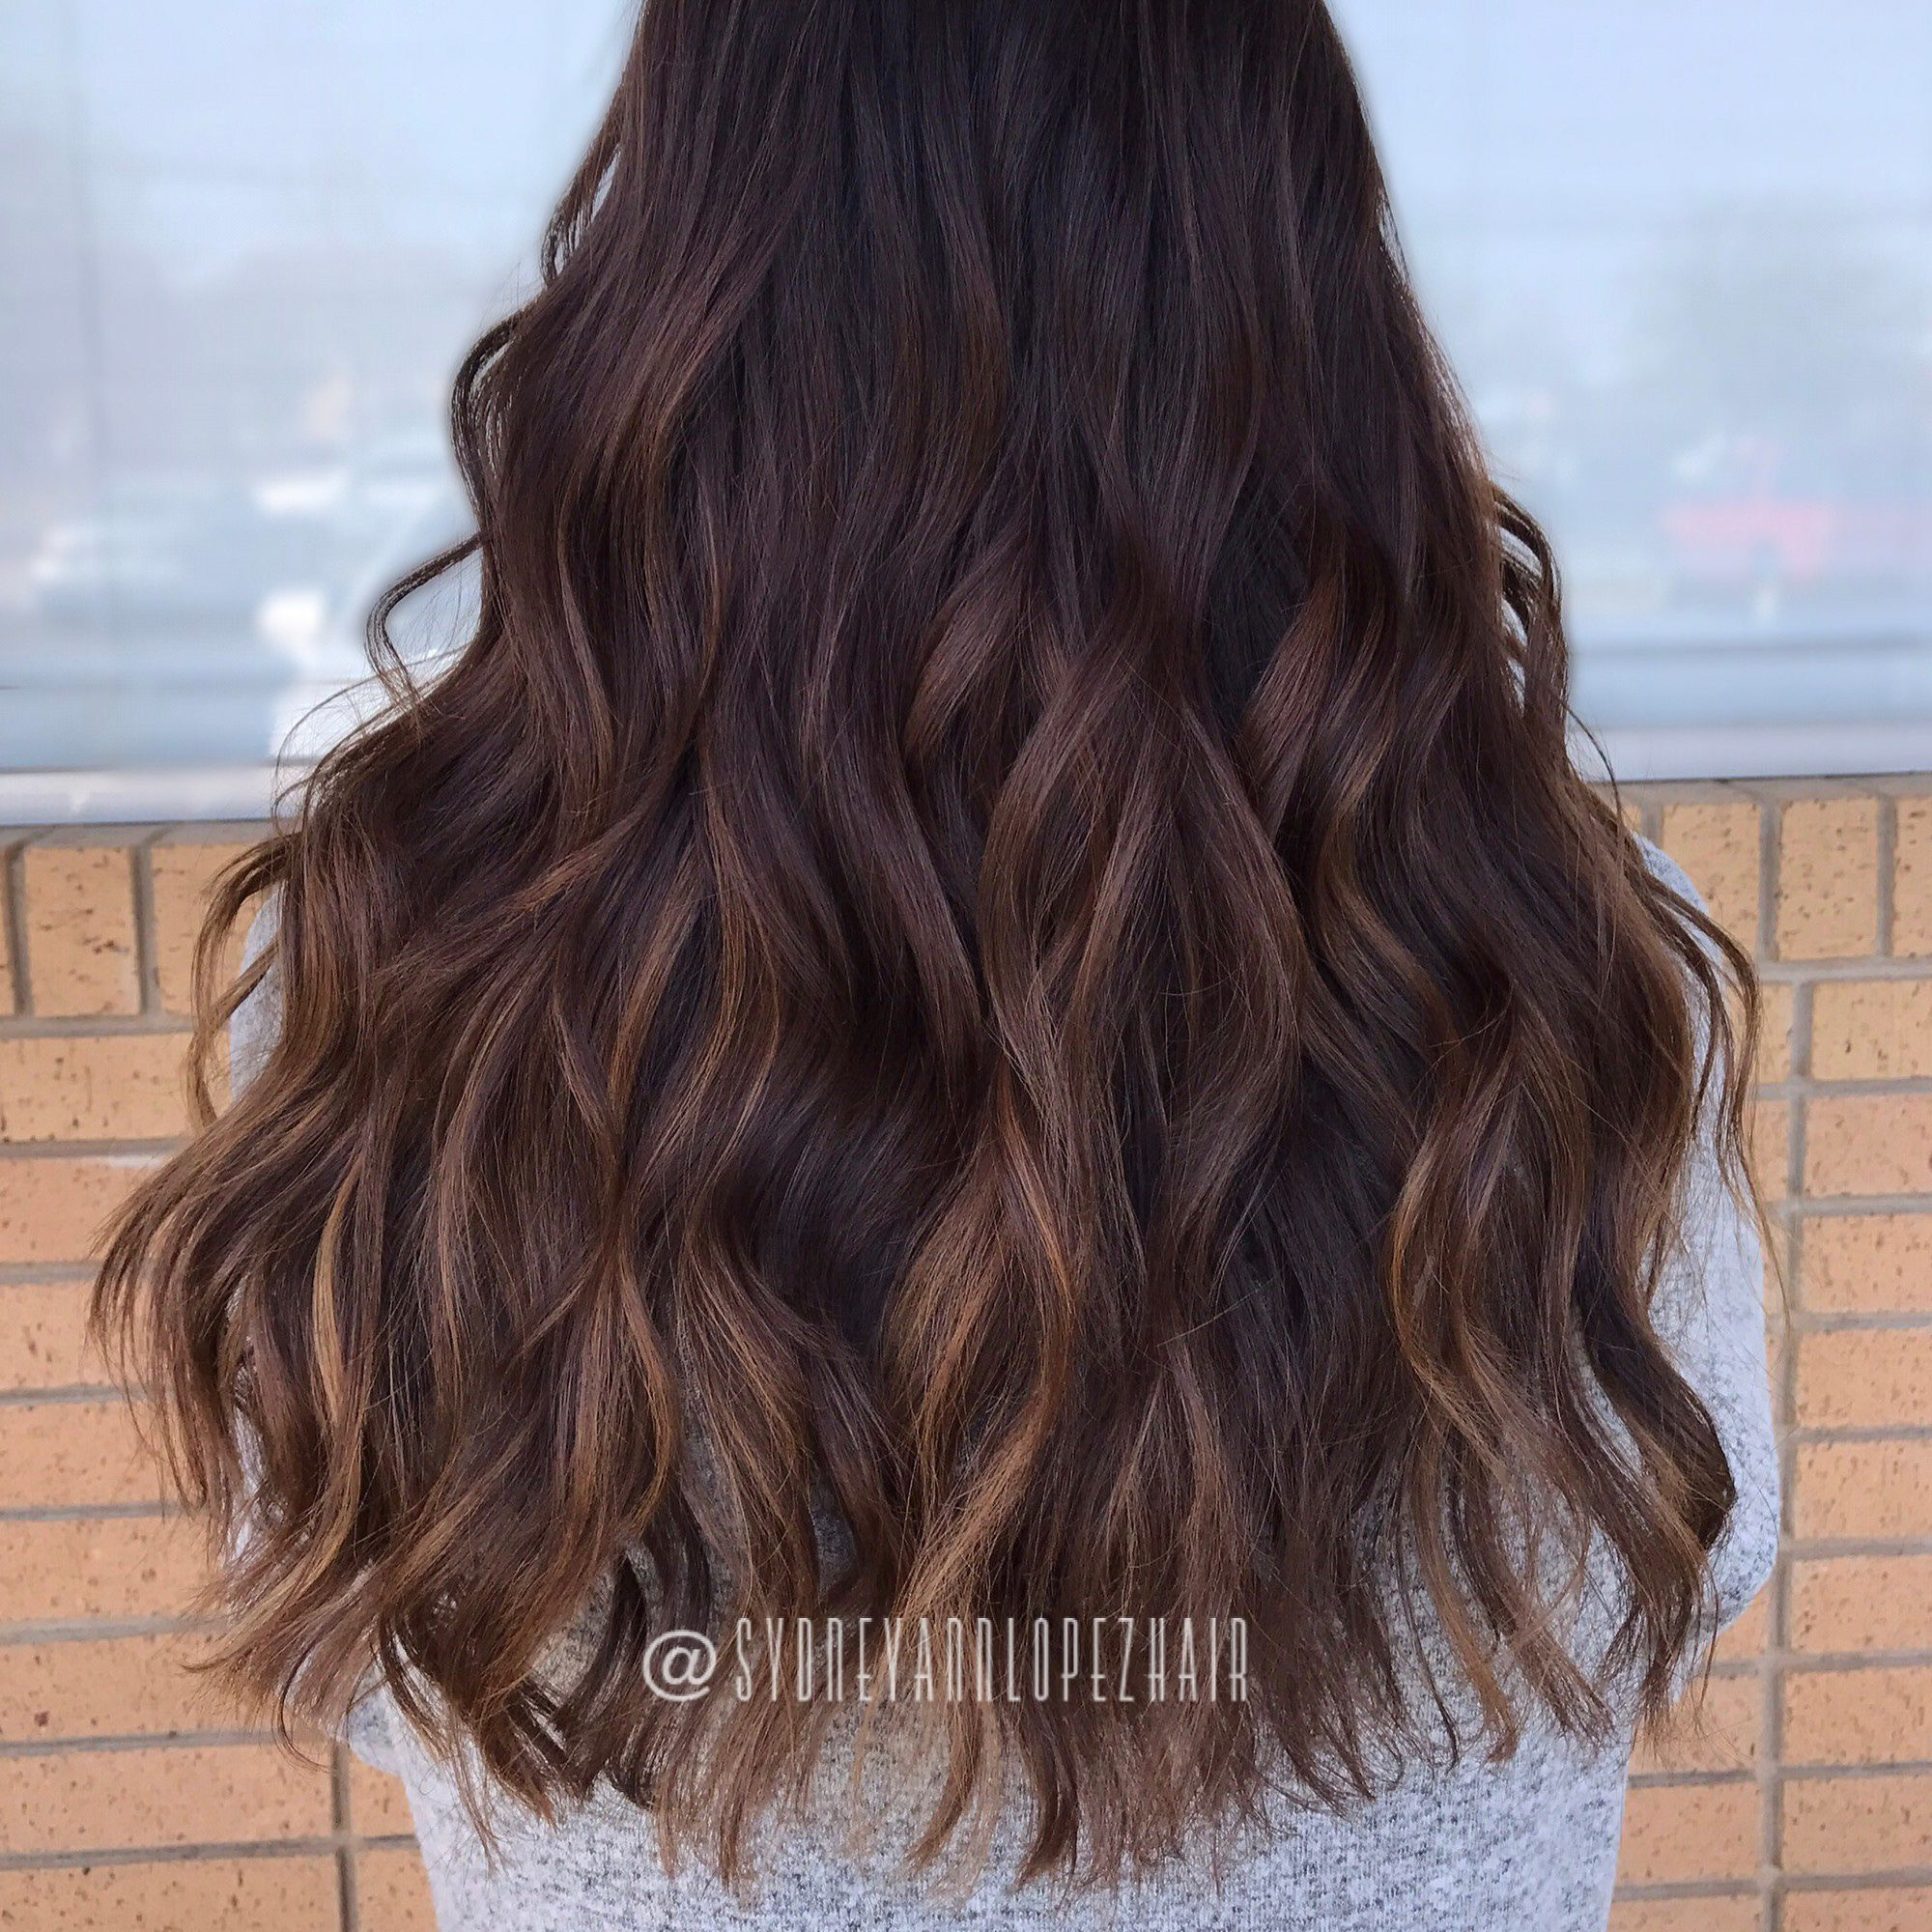 Dark Chocolate Base Caramel Butterscotch Balayage Goodhairdaybysydlopez Headlineshairdesigndentontx Natural Hair Color Balayage Hair Brunette Hair Color